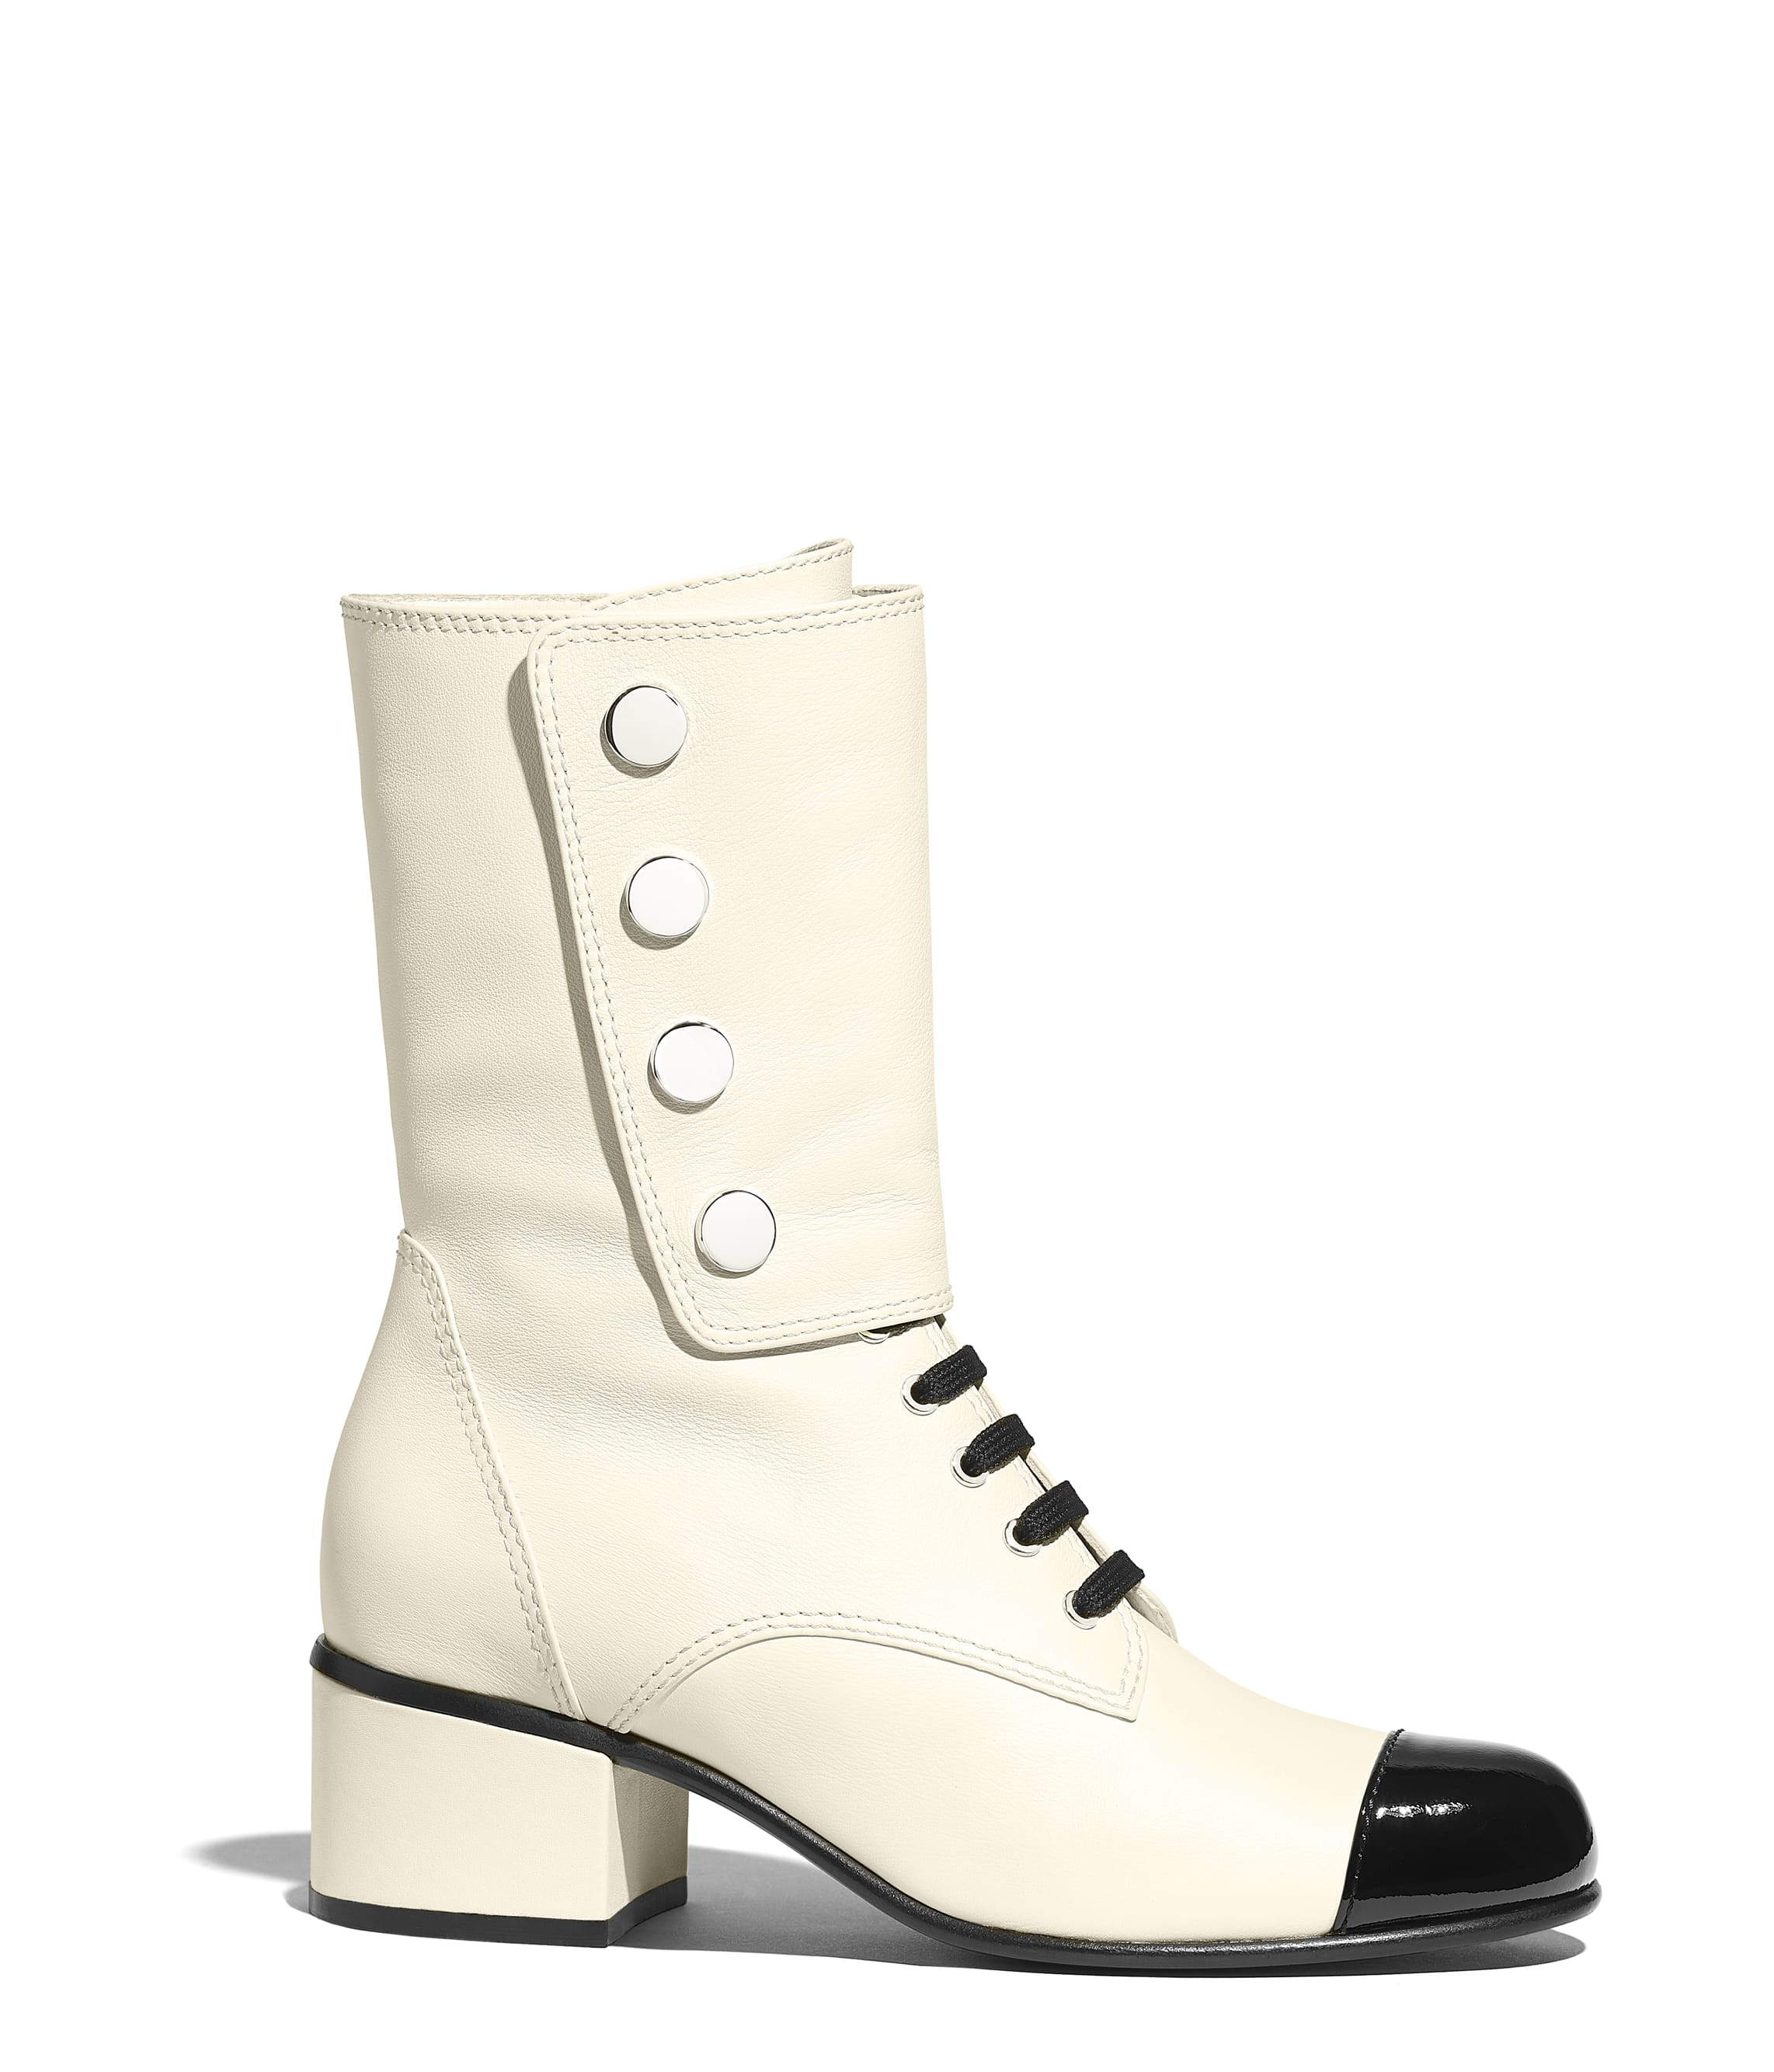 9ef87facc3c Shoes - CHANEL